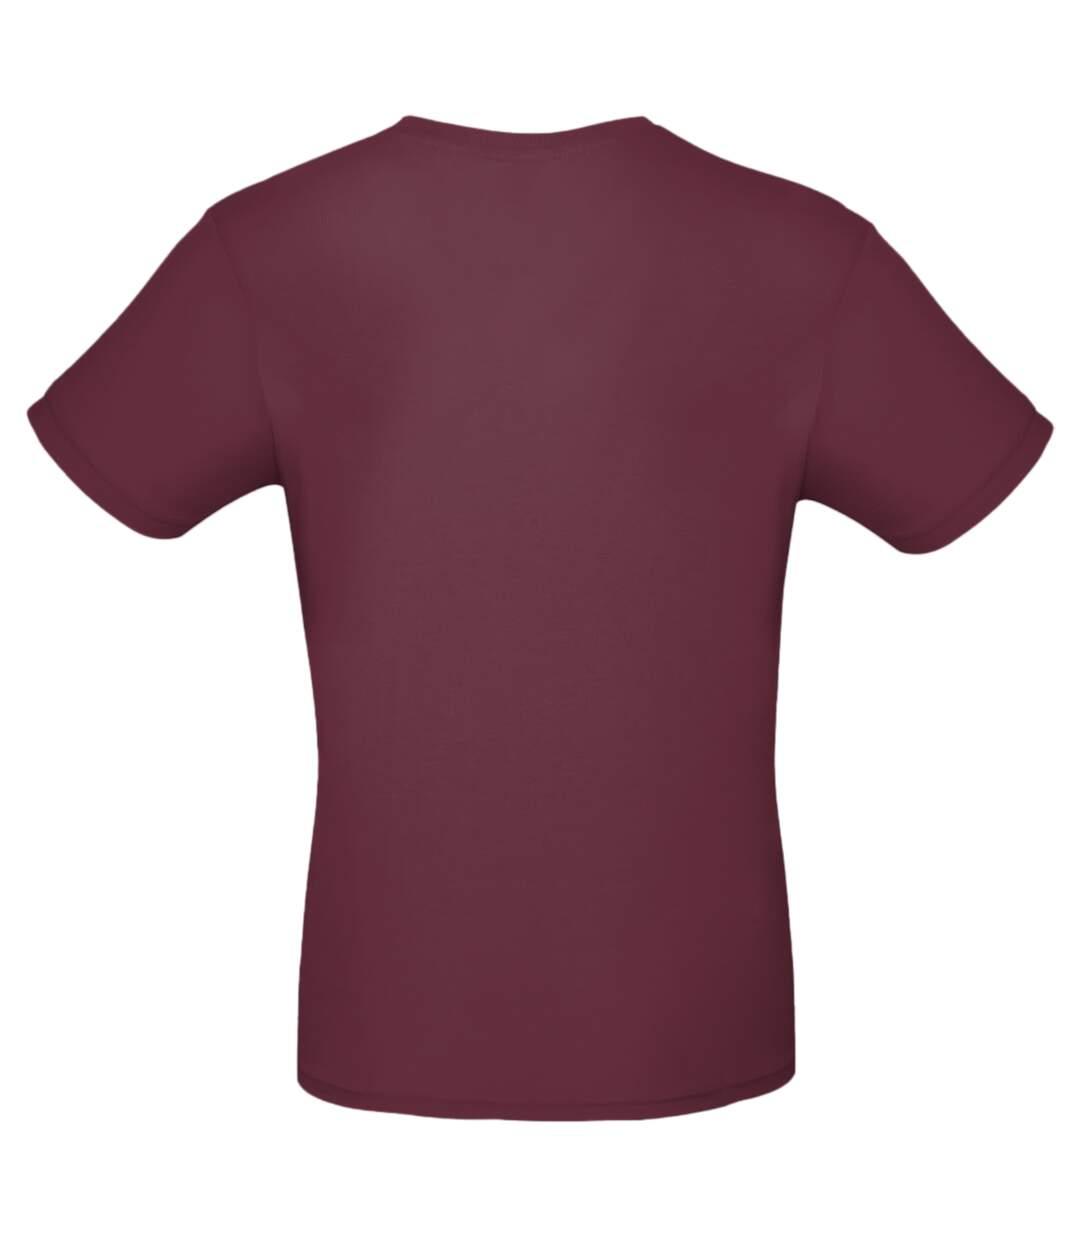 B&C Mens #E150 Tee (Red) - UTBC3910